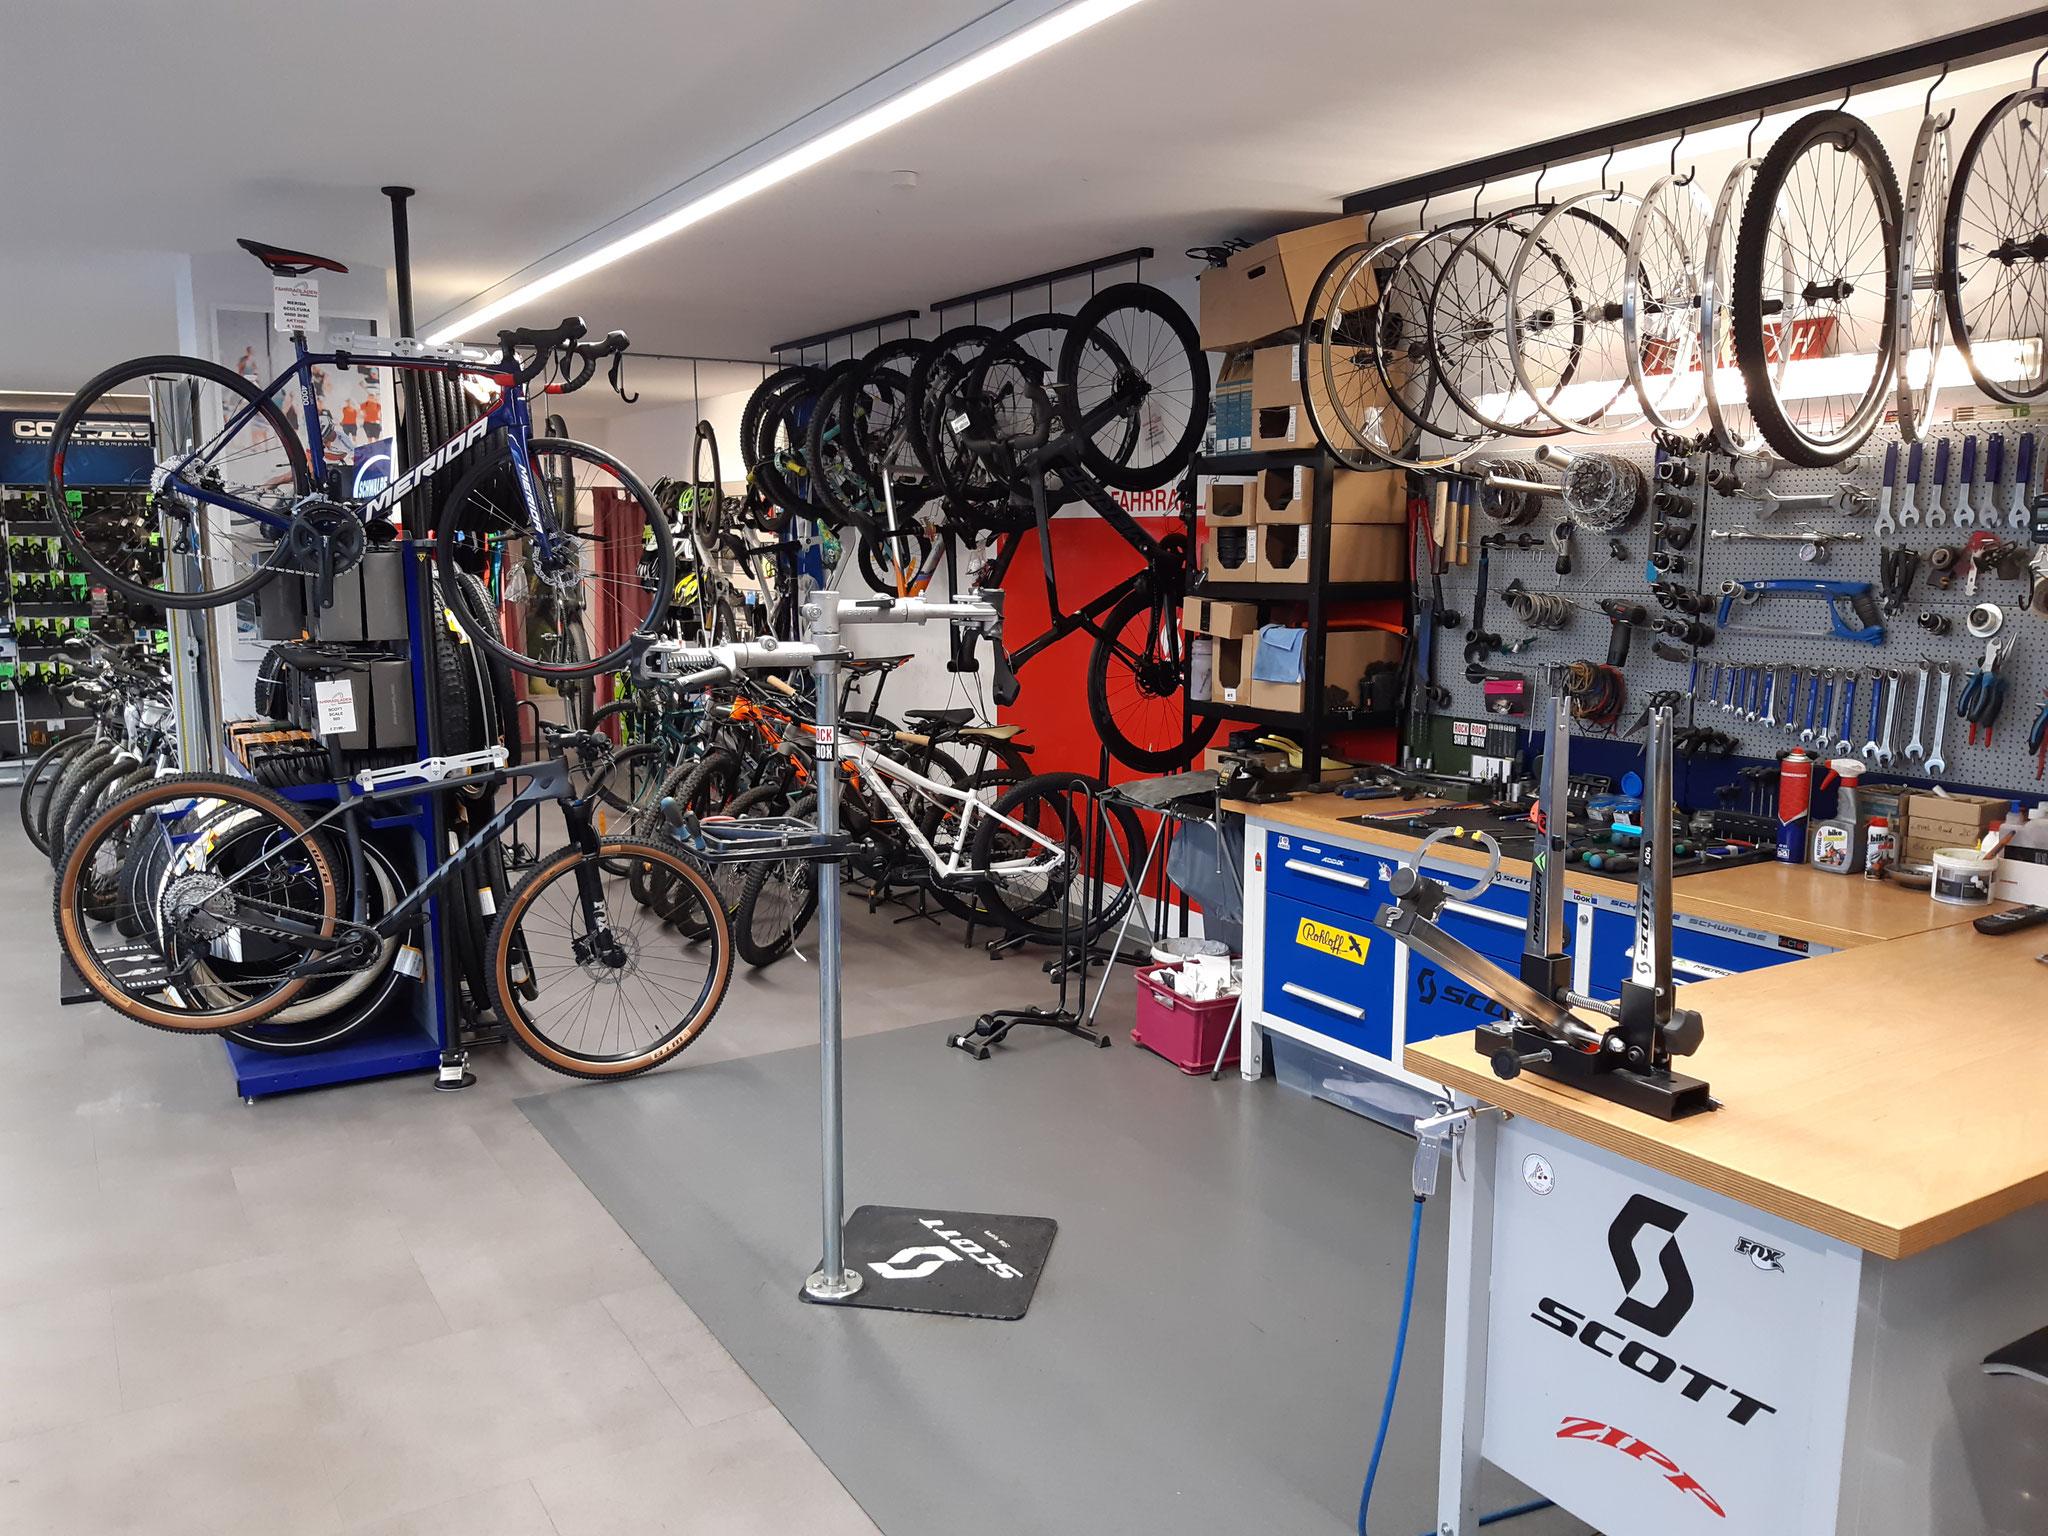 Fahrräder für Alle FAHRRADLADEN INNSBRUCK